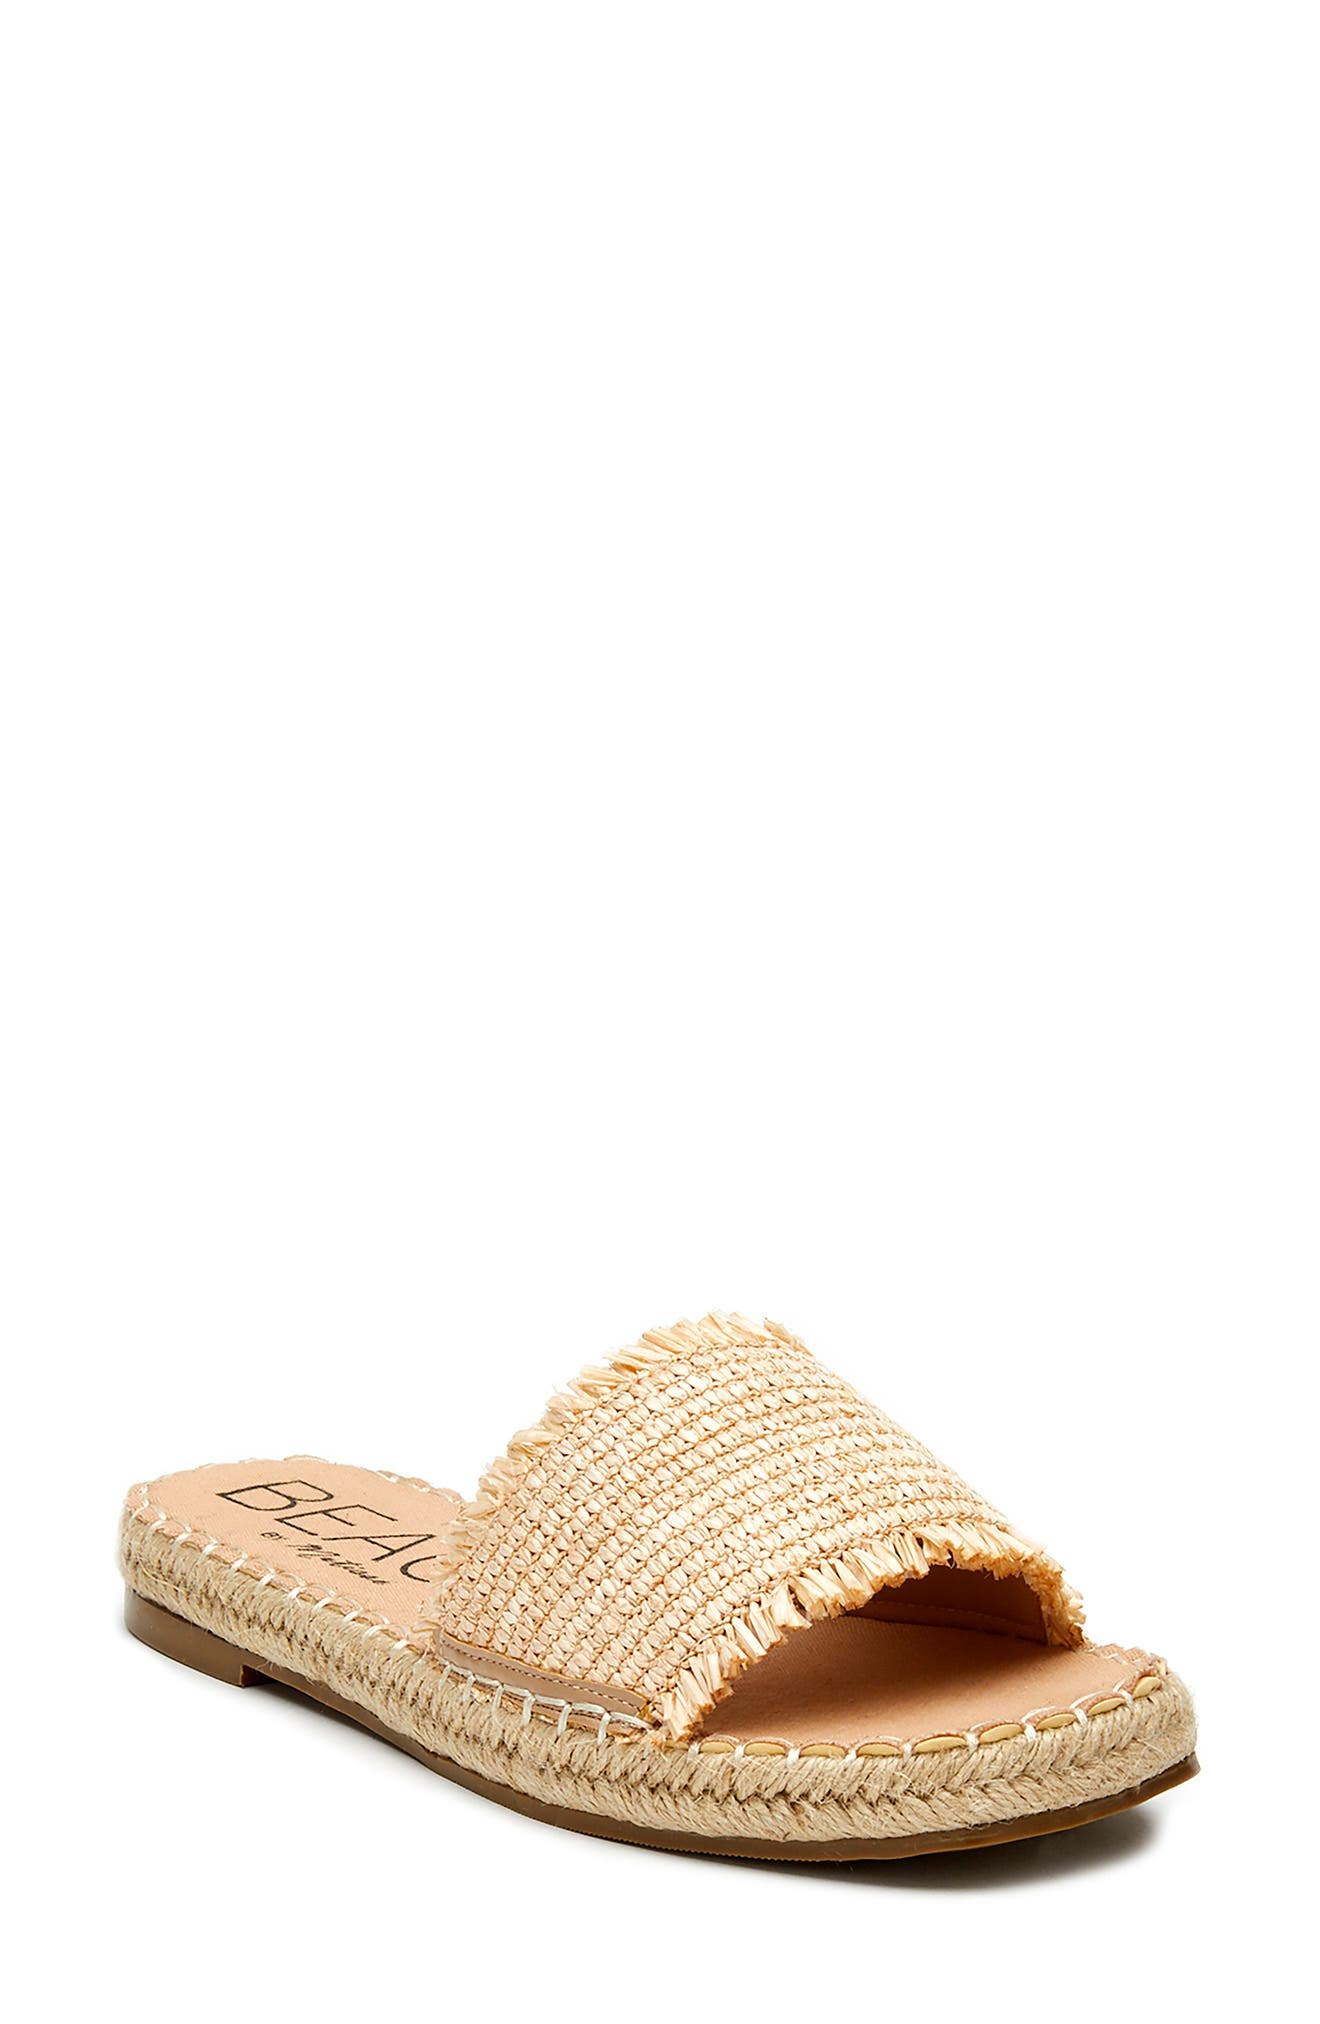 Koko Slide Sandal